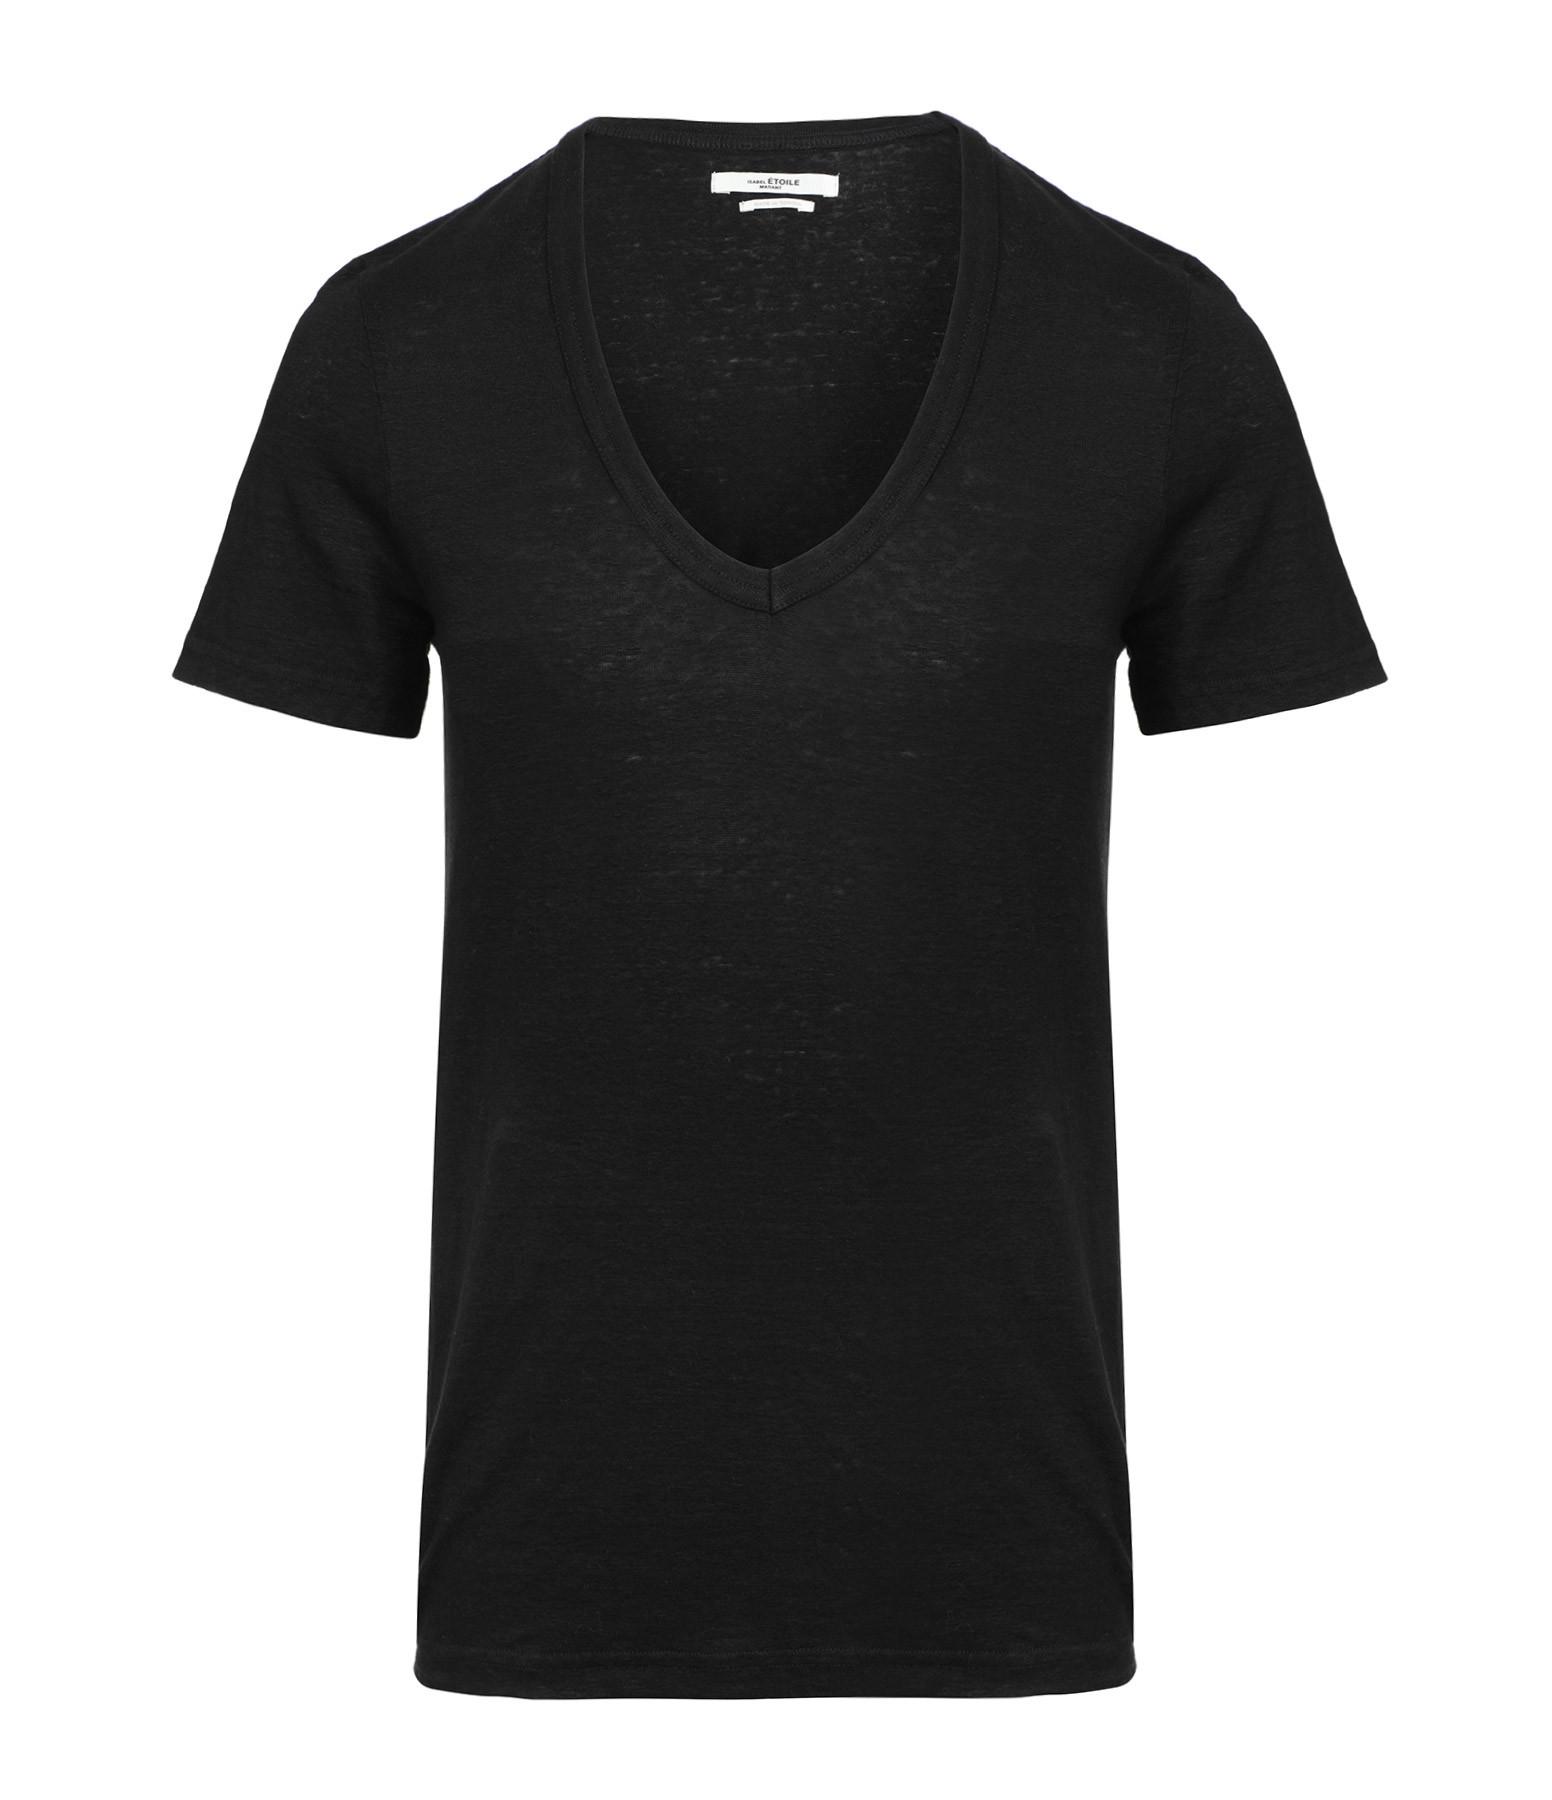 ISABEL MARANT ÉTOILE - Tee-shirt Kranger Lin Noir